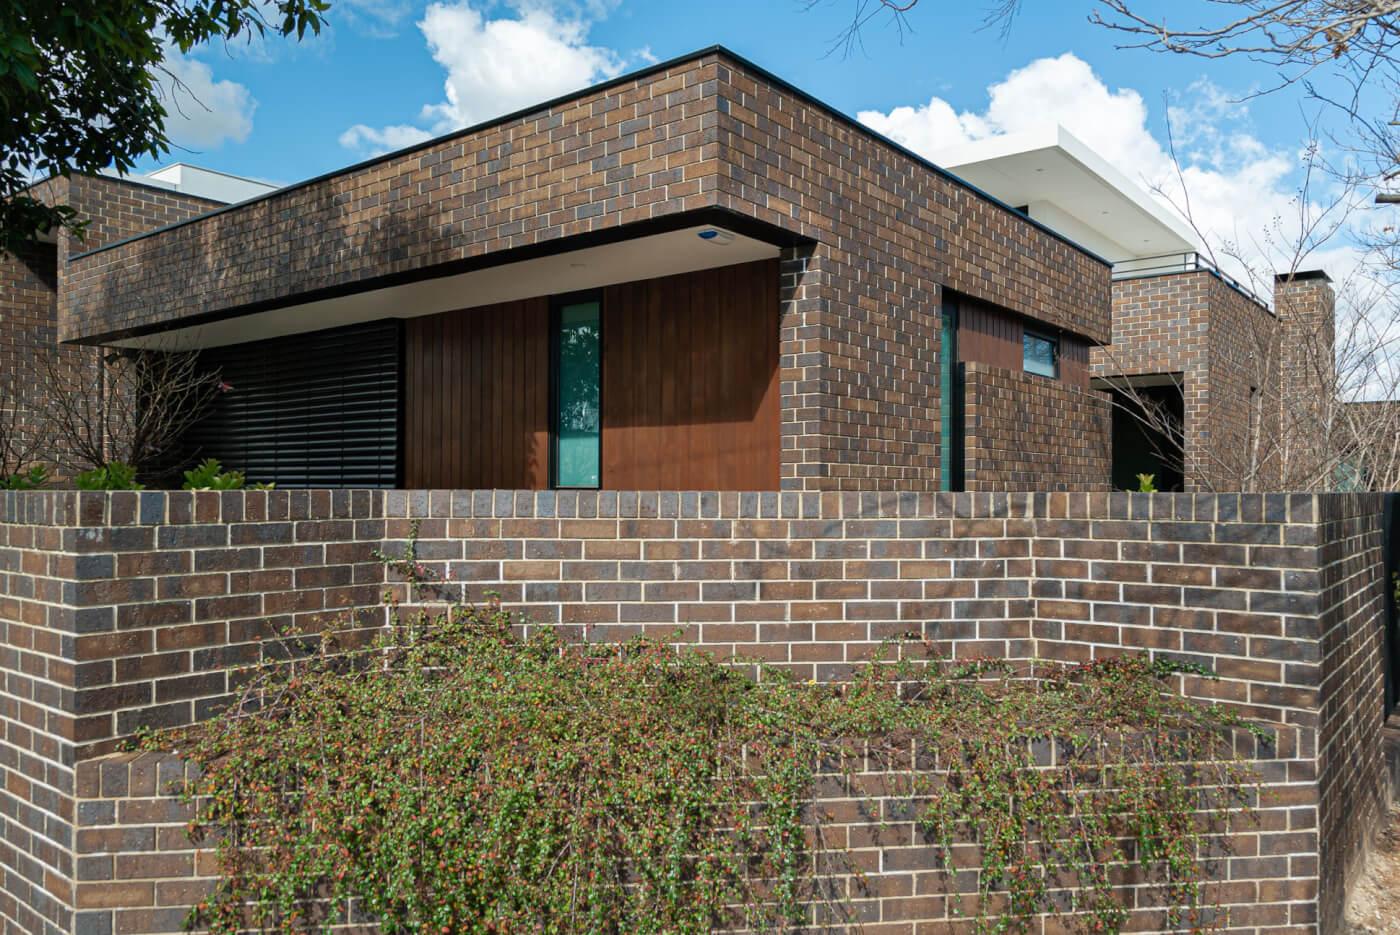 Coachhouse Brick 76mm Hyde Park Littlehampon Bricks And Pavers Reduced 17